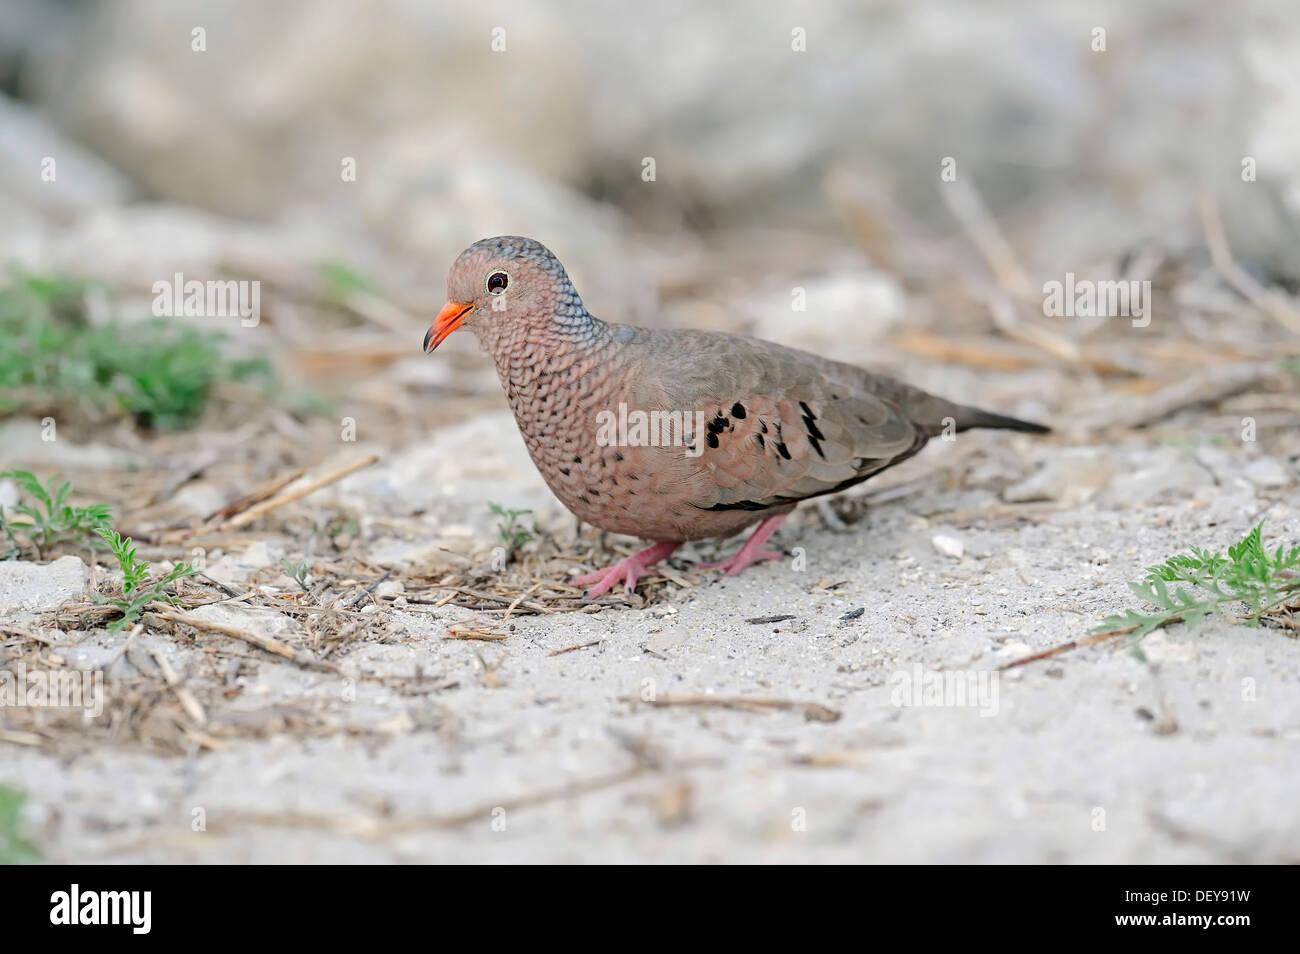 Common Ground Dove (Columbina passerina), male, Sanibel Island, Florida, United States - Stock Image